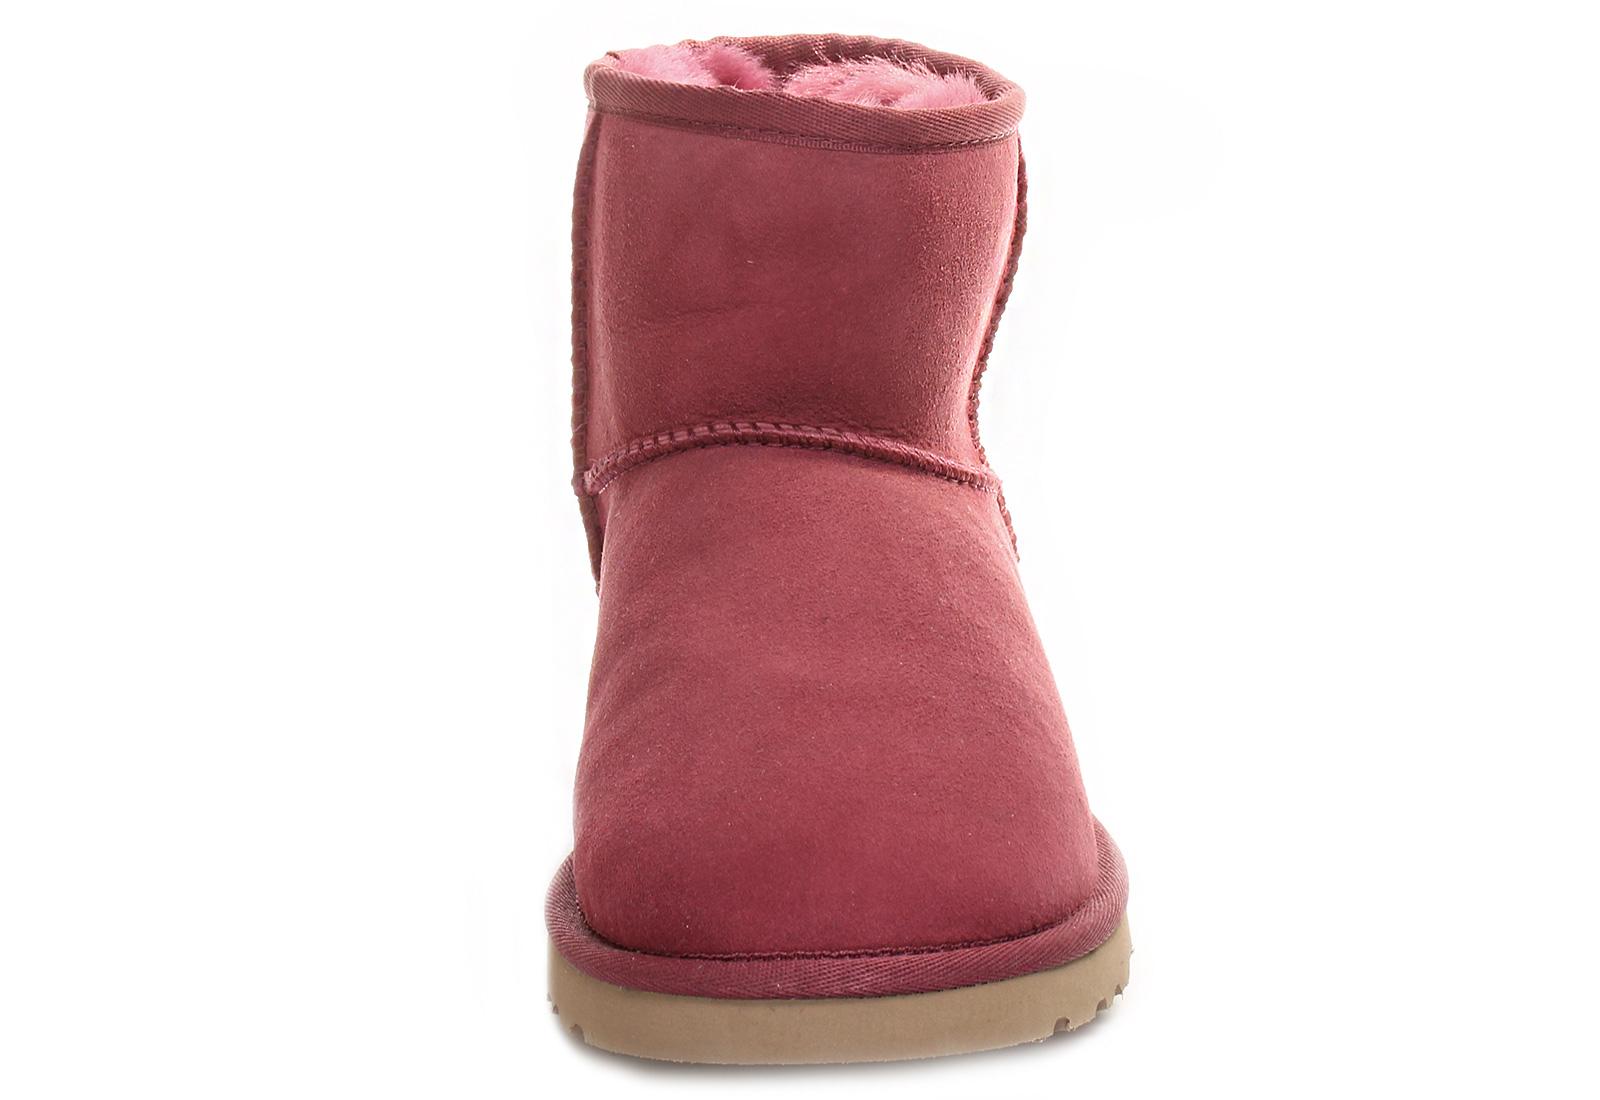 classic ugg boots 2013